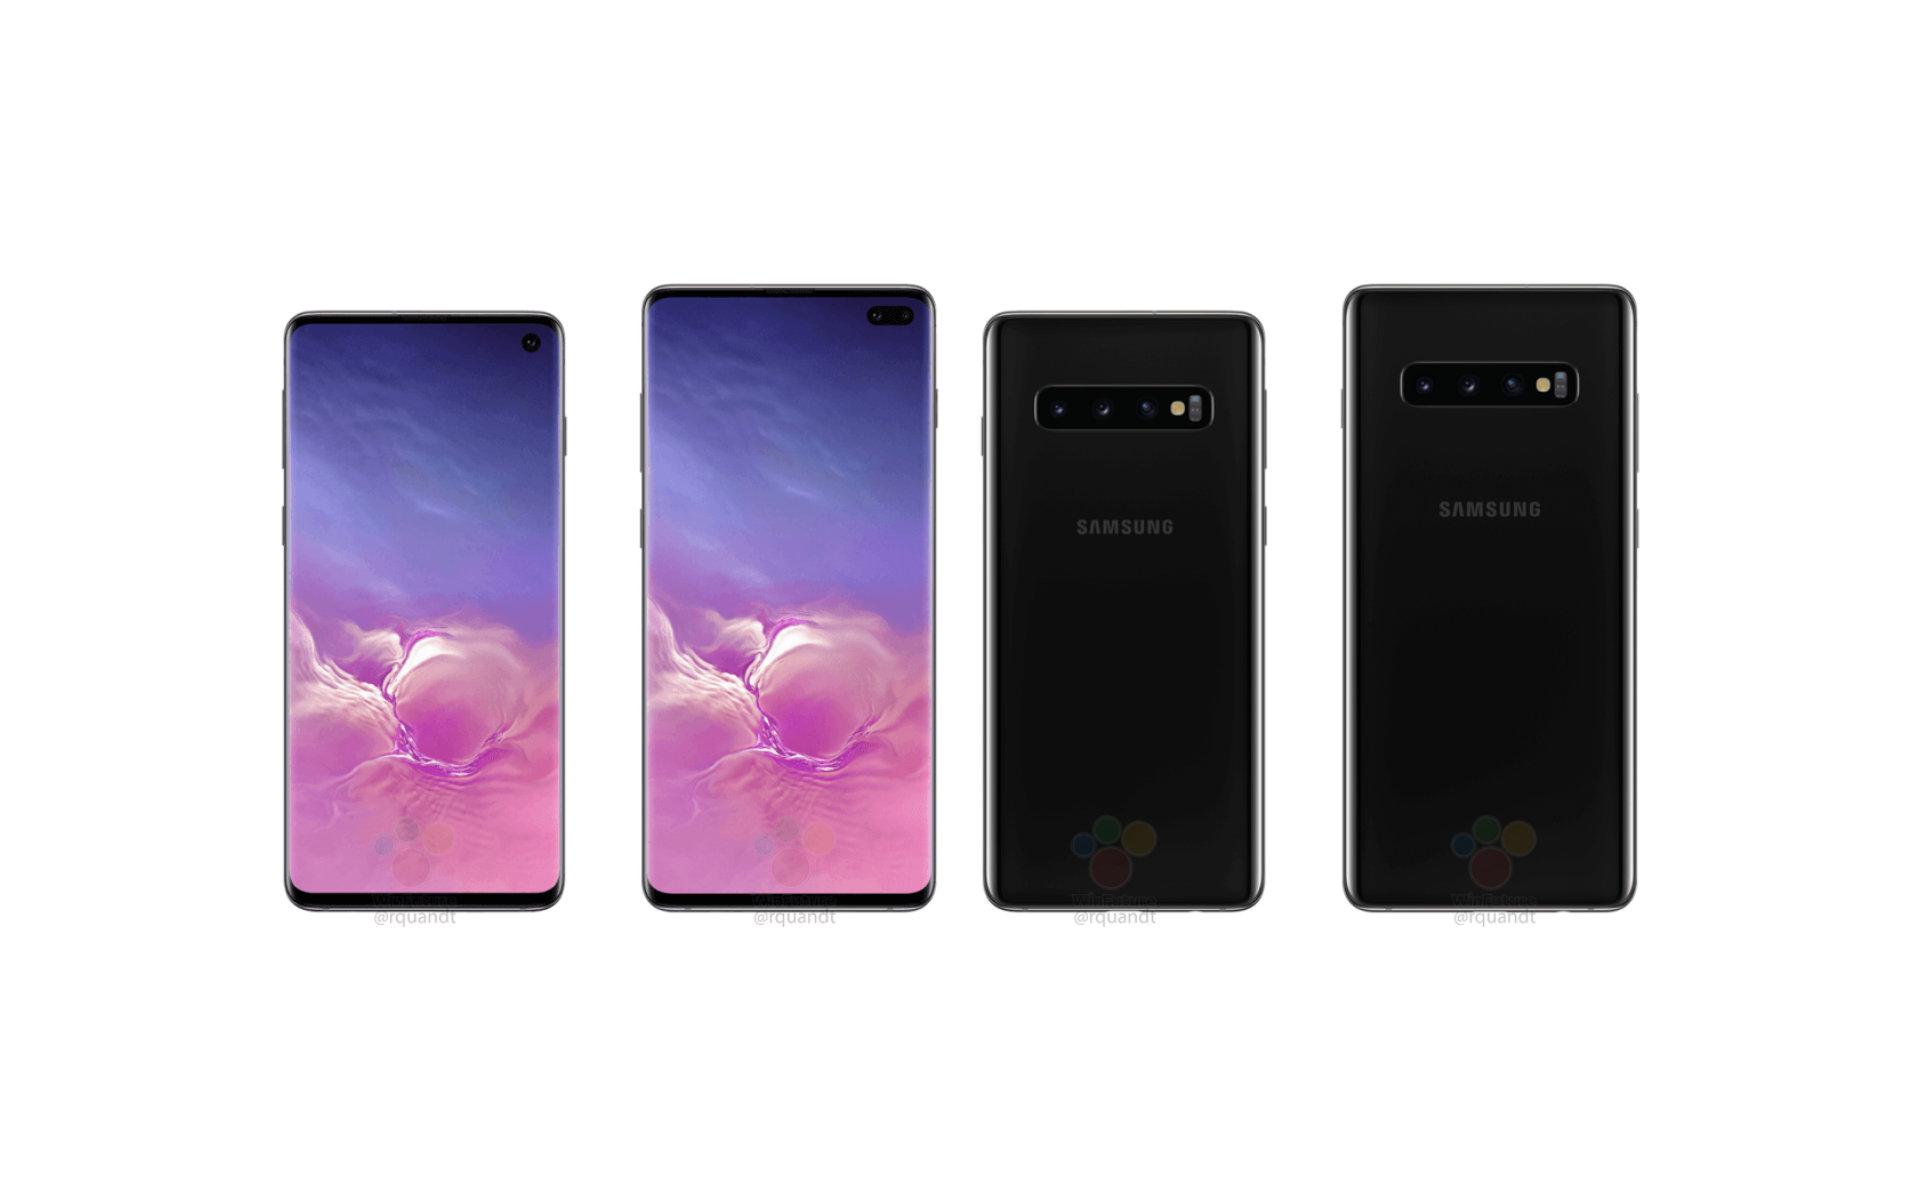 Le Samsung Galaxy S10 sera l'un des premiers smartphones Wi-Fi 6